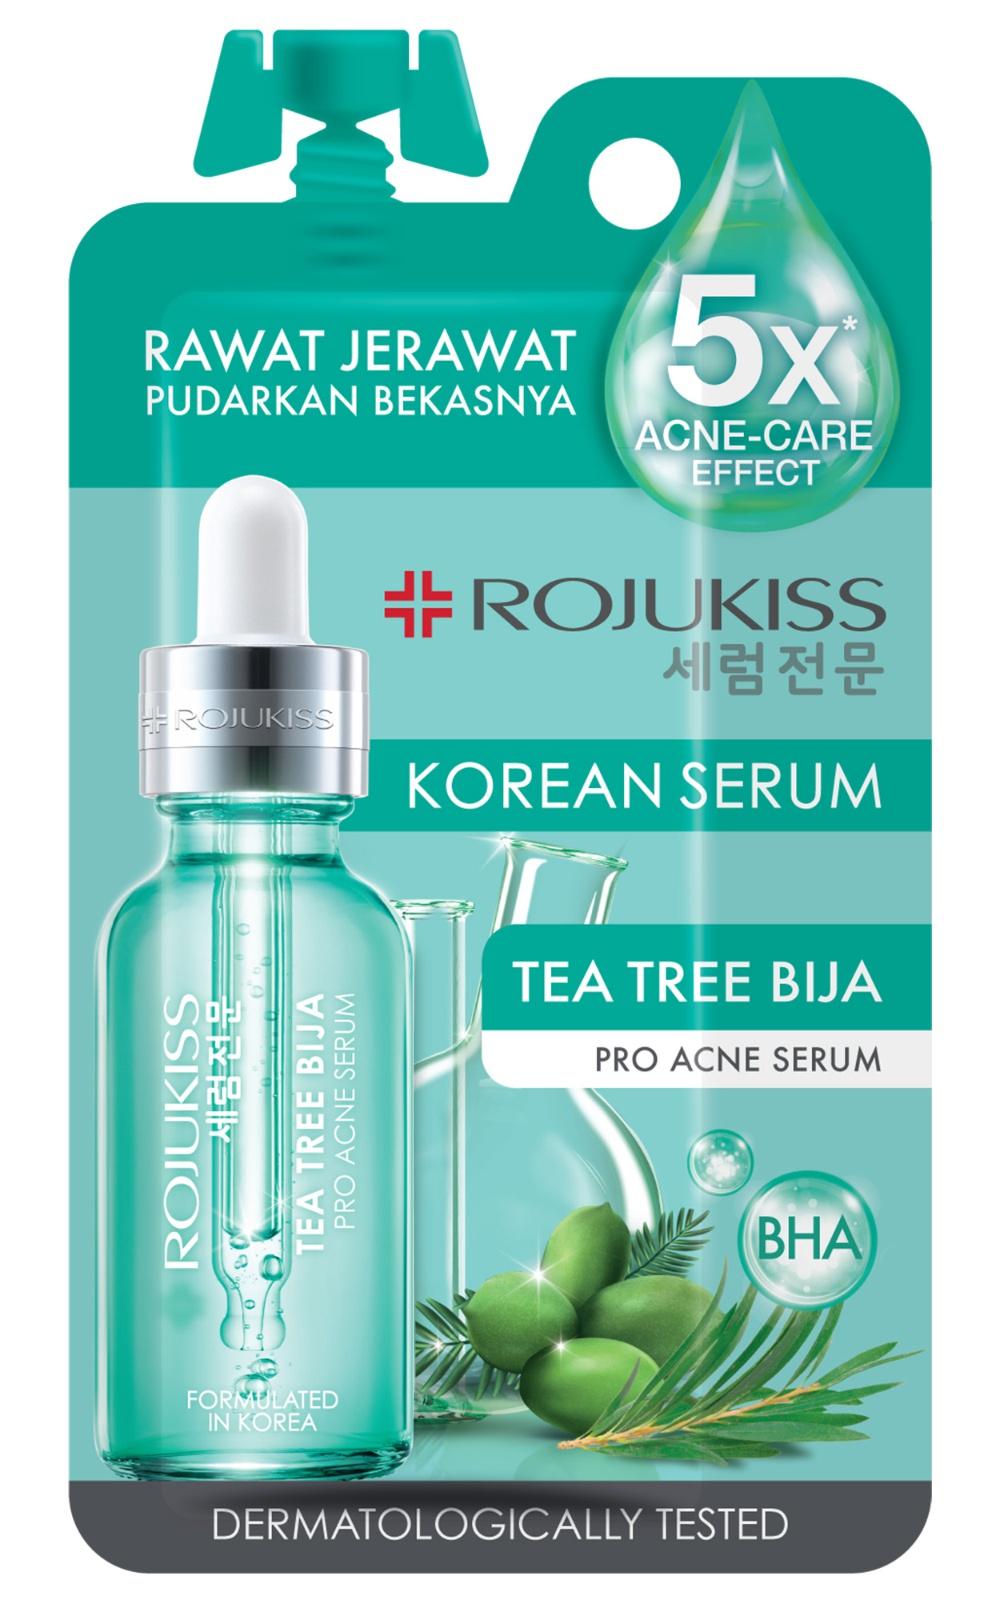 Rojukiss Tea Tree Bija Pro Acne Serum